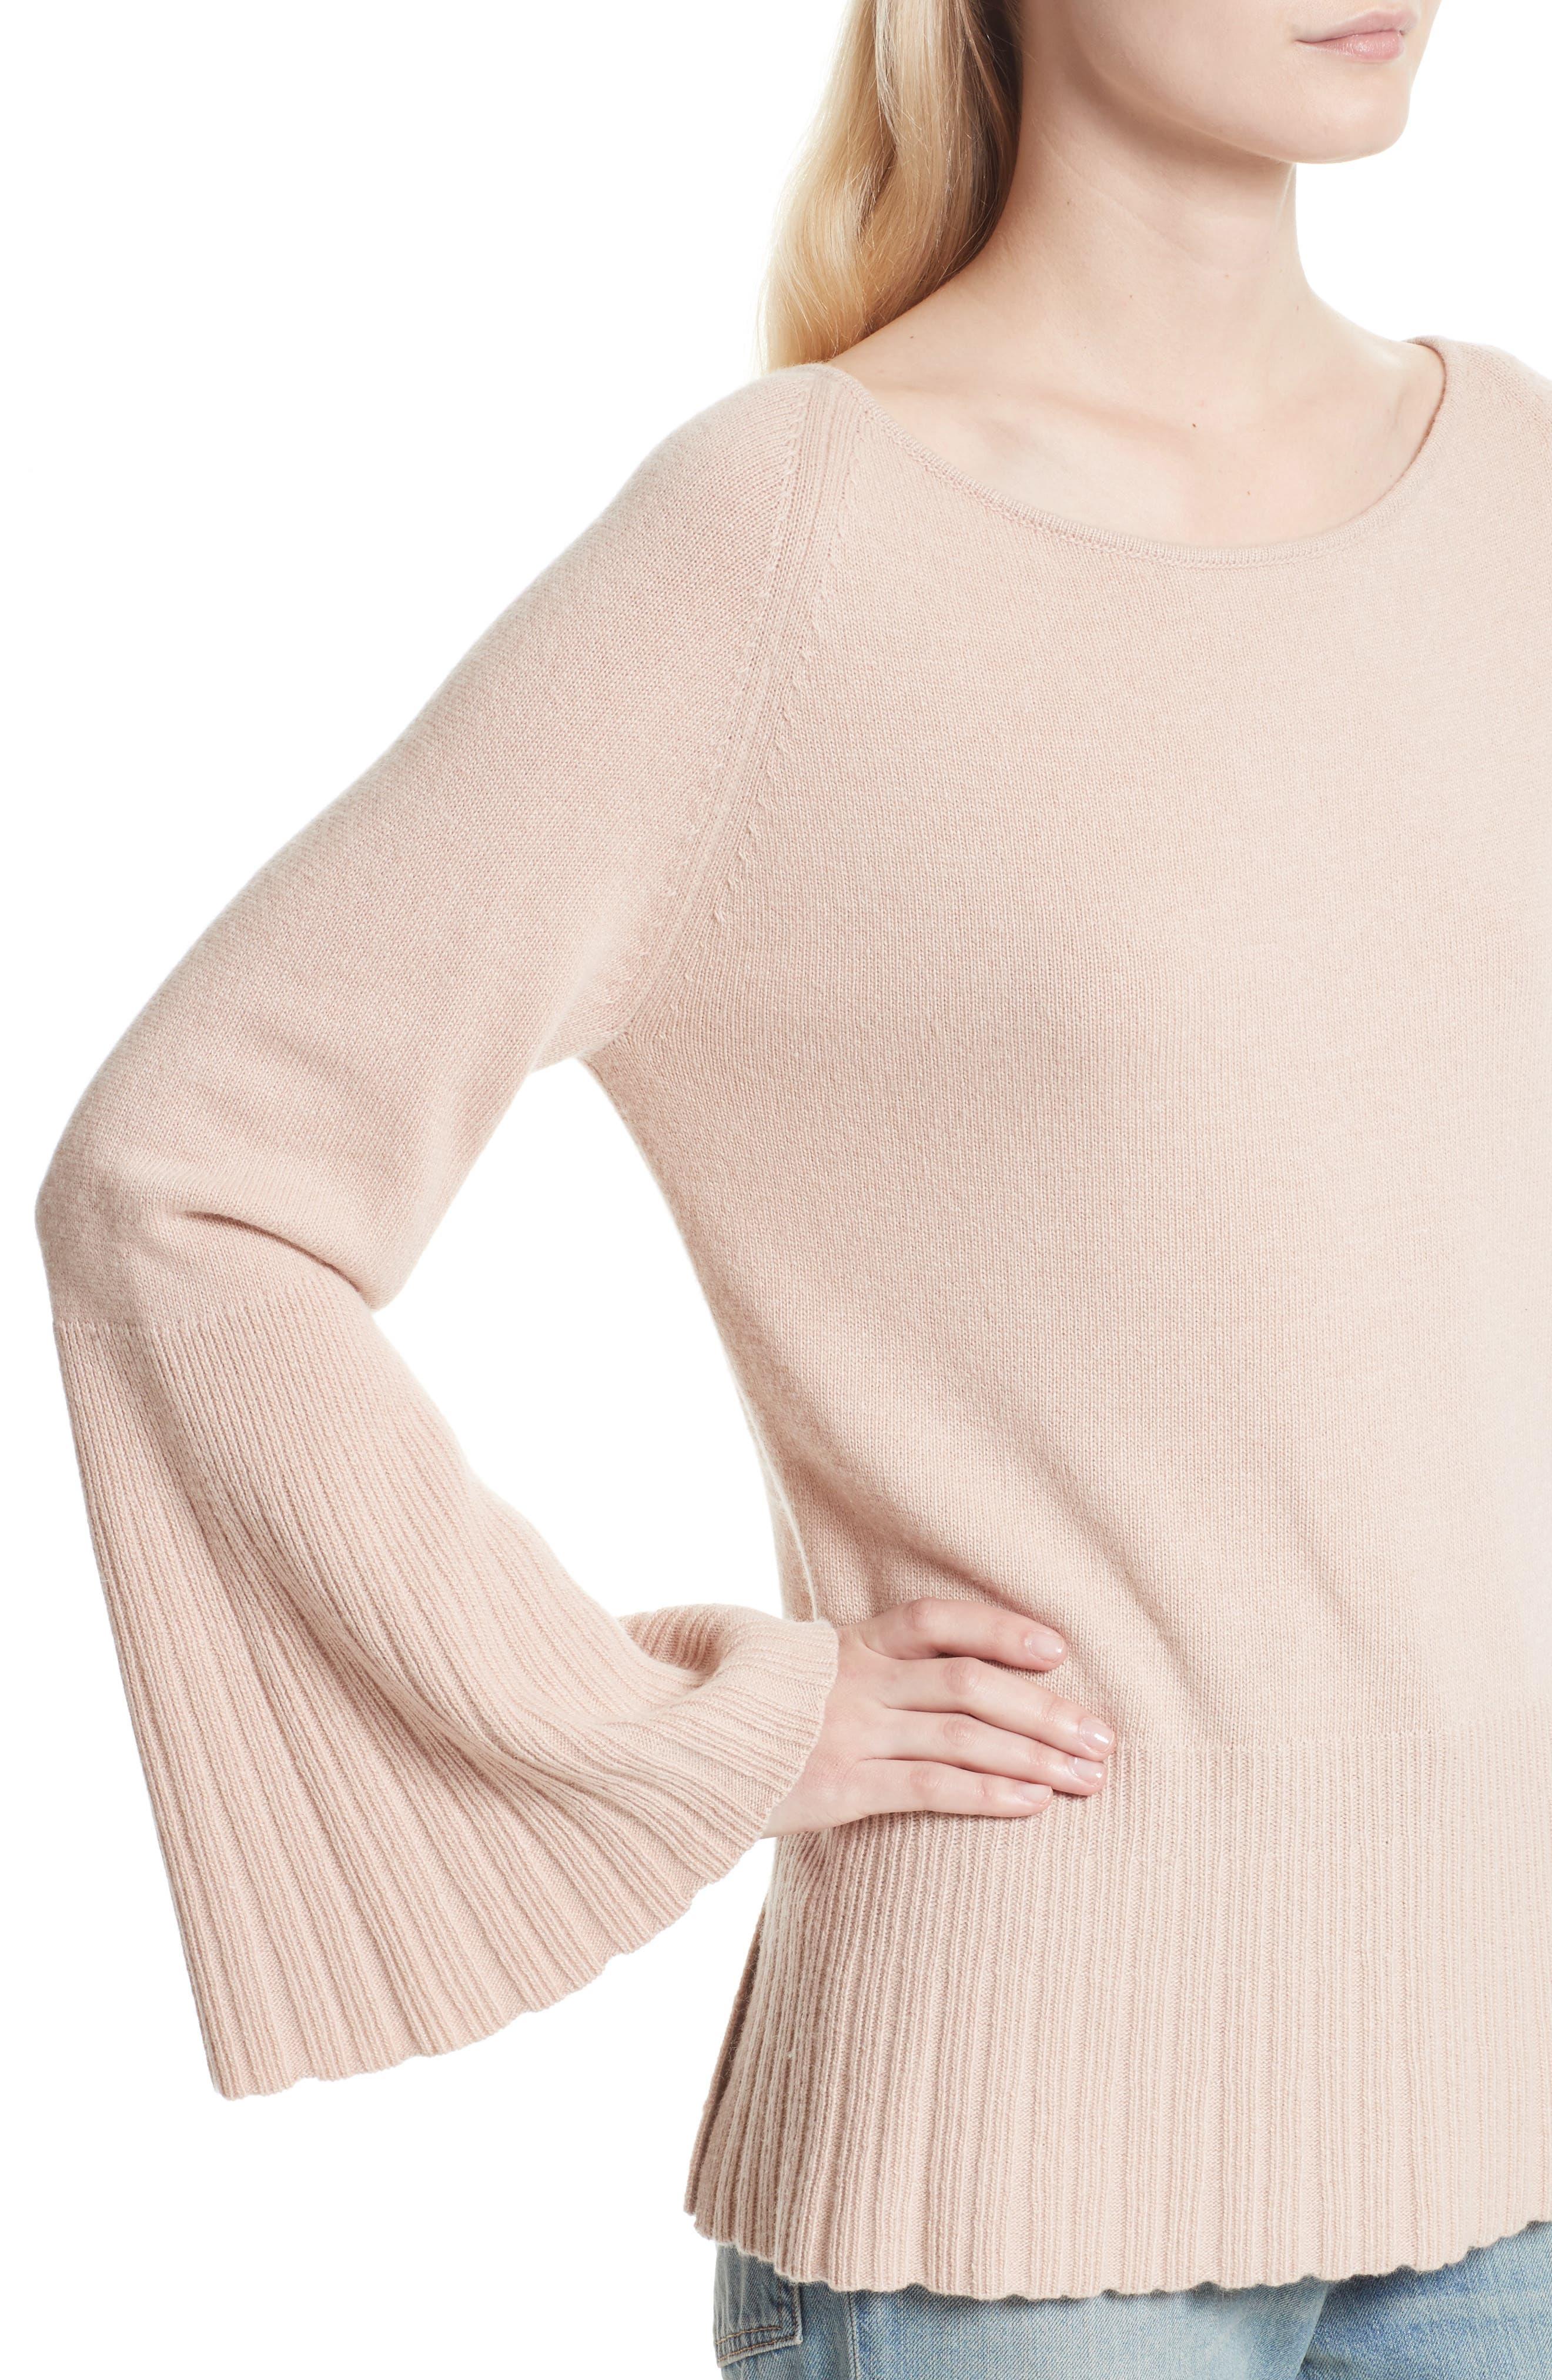 Clarette Bell Sleeve Sweater,                             Alternate thumbnail 4, color,                             650